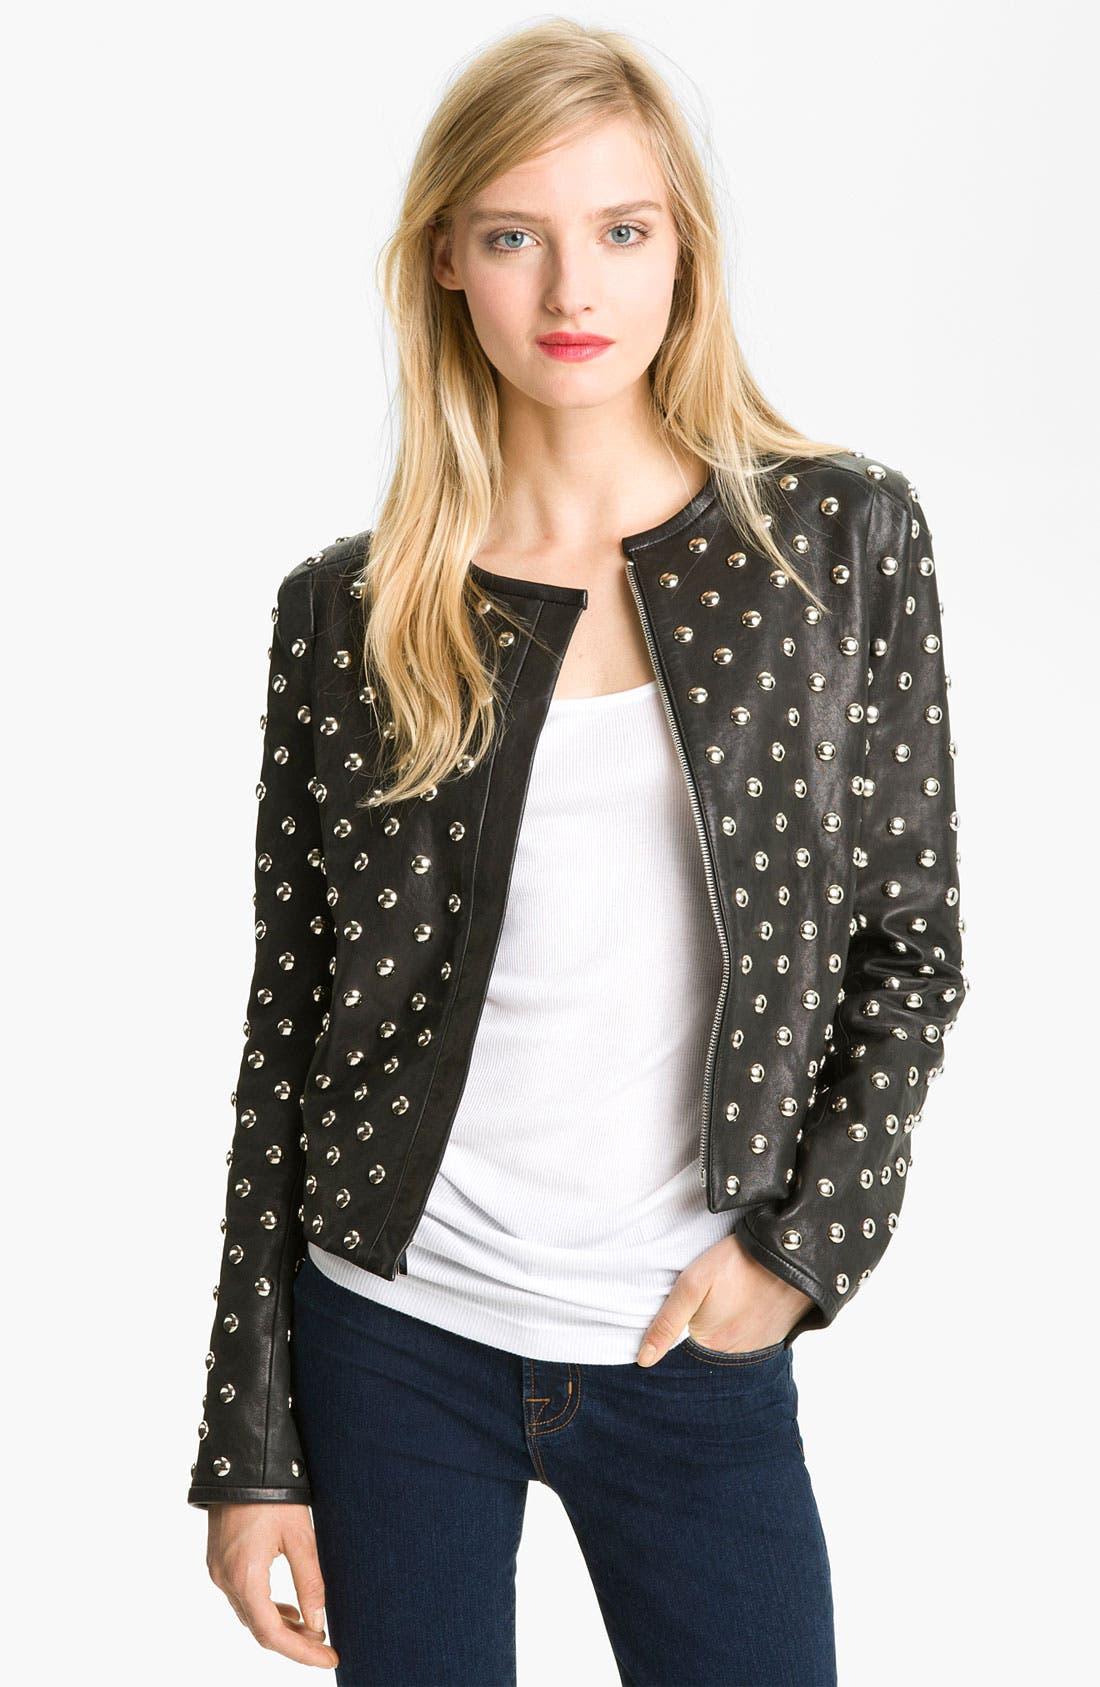 Main Image - Diane von Furstenberg 'Kate' Studded Leather Jacket